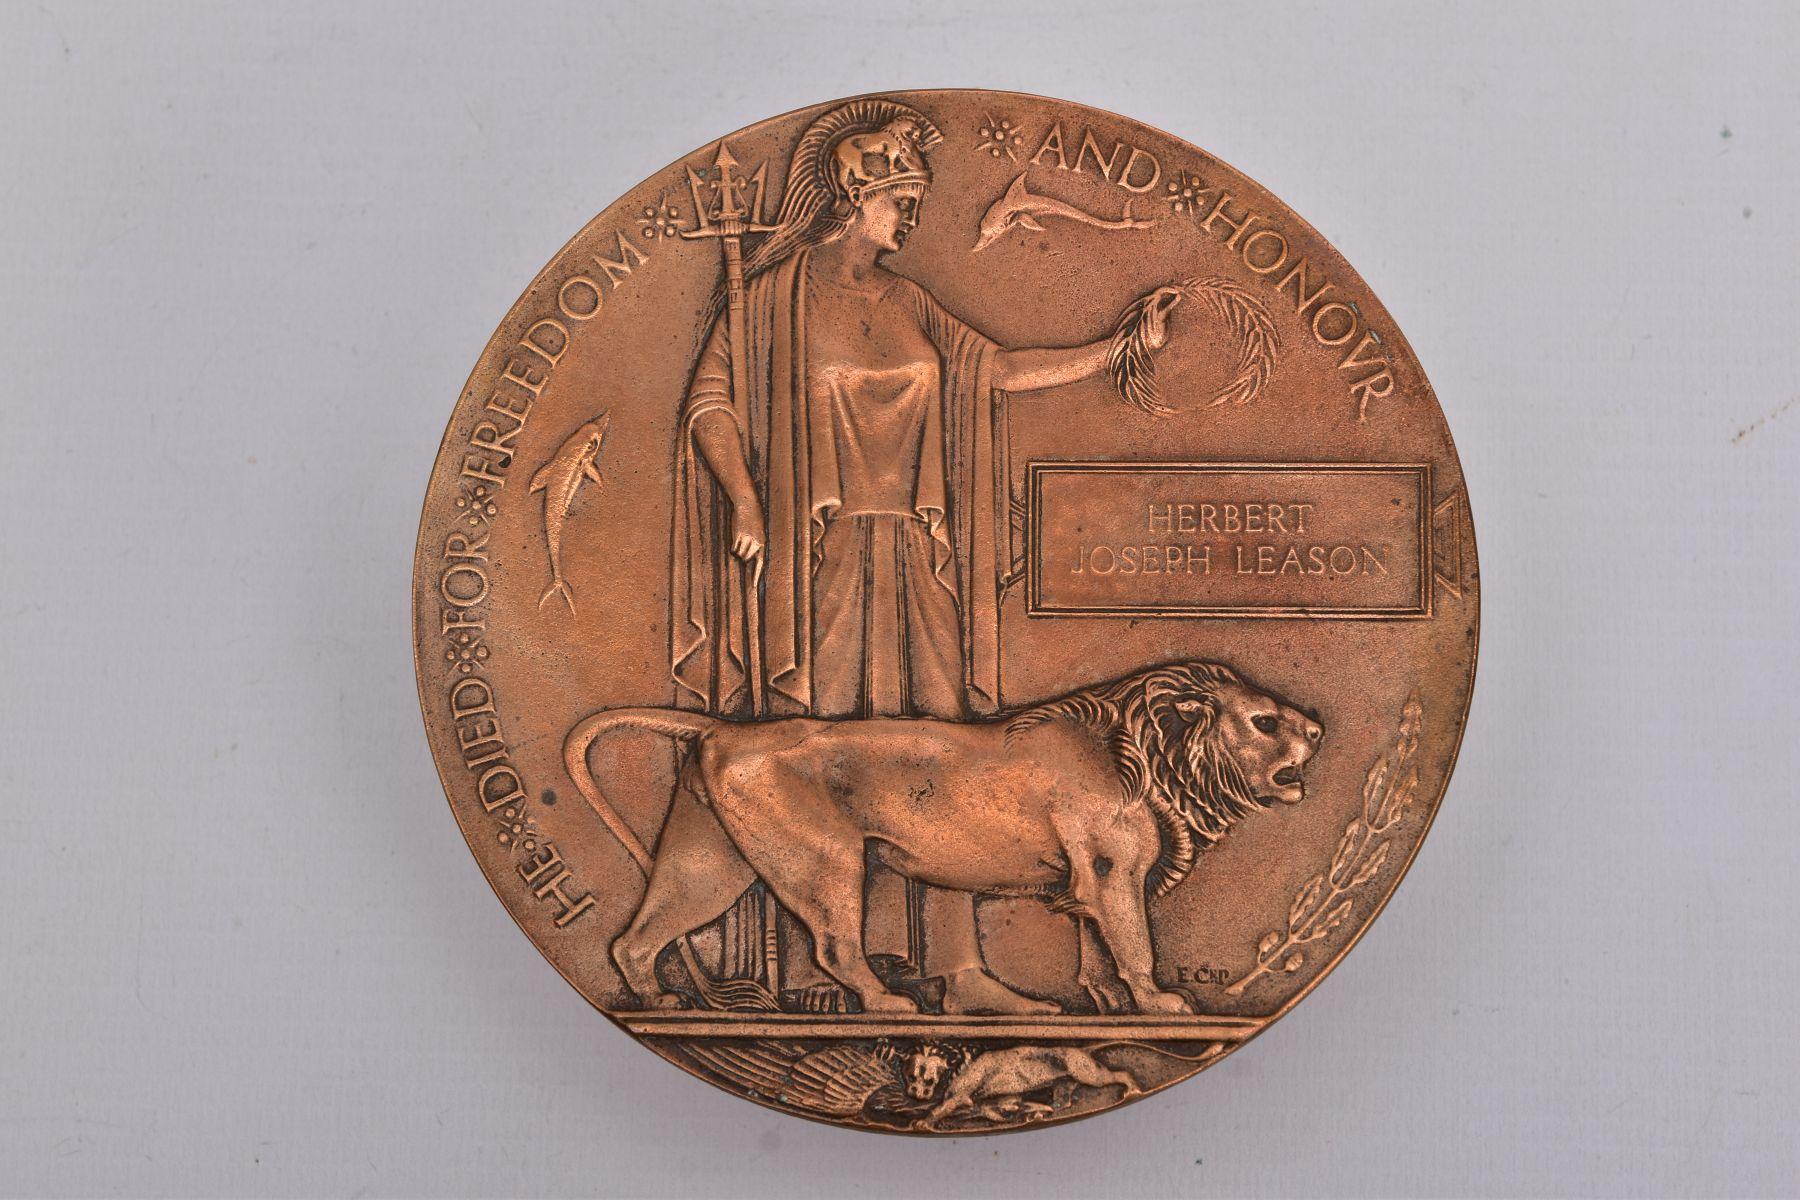 A WWI MEMORIAL DEATH PLAQUE, named Herbert Joseph Leason, Herbert was the son of Arthur & Eliza